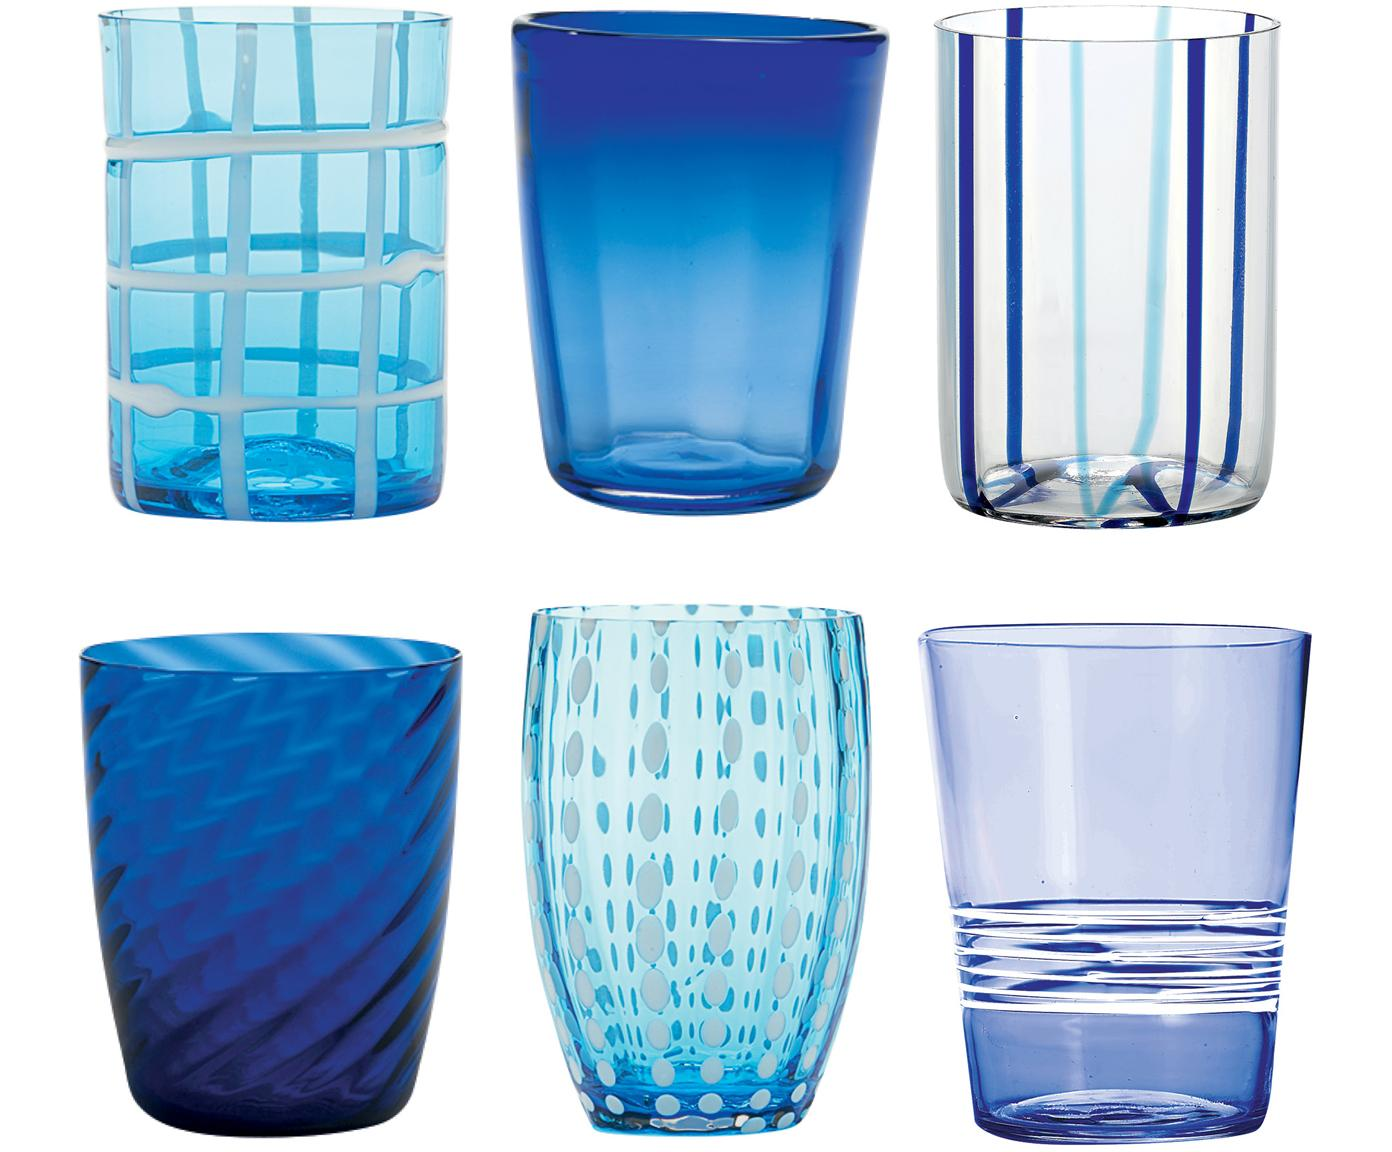 Mondgeblazen waterglazenset Melting Pot Sea, 6-delig, Glas, Blauwtinten, transparant, Verschillende formaten